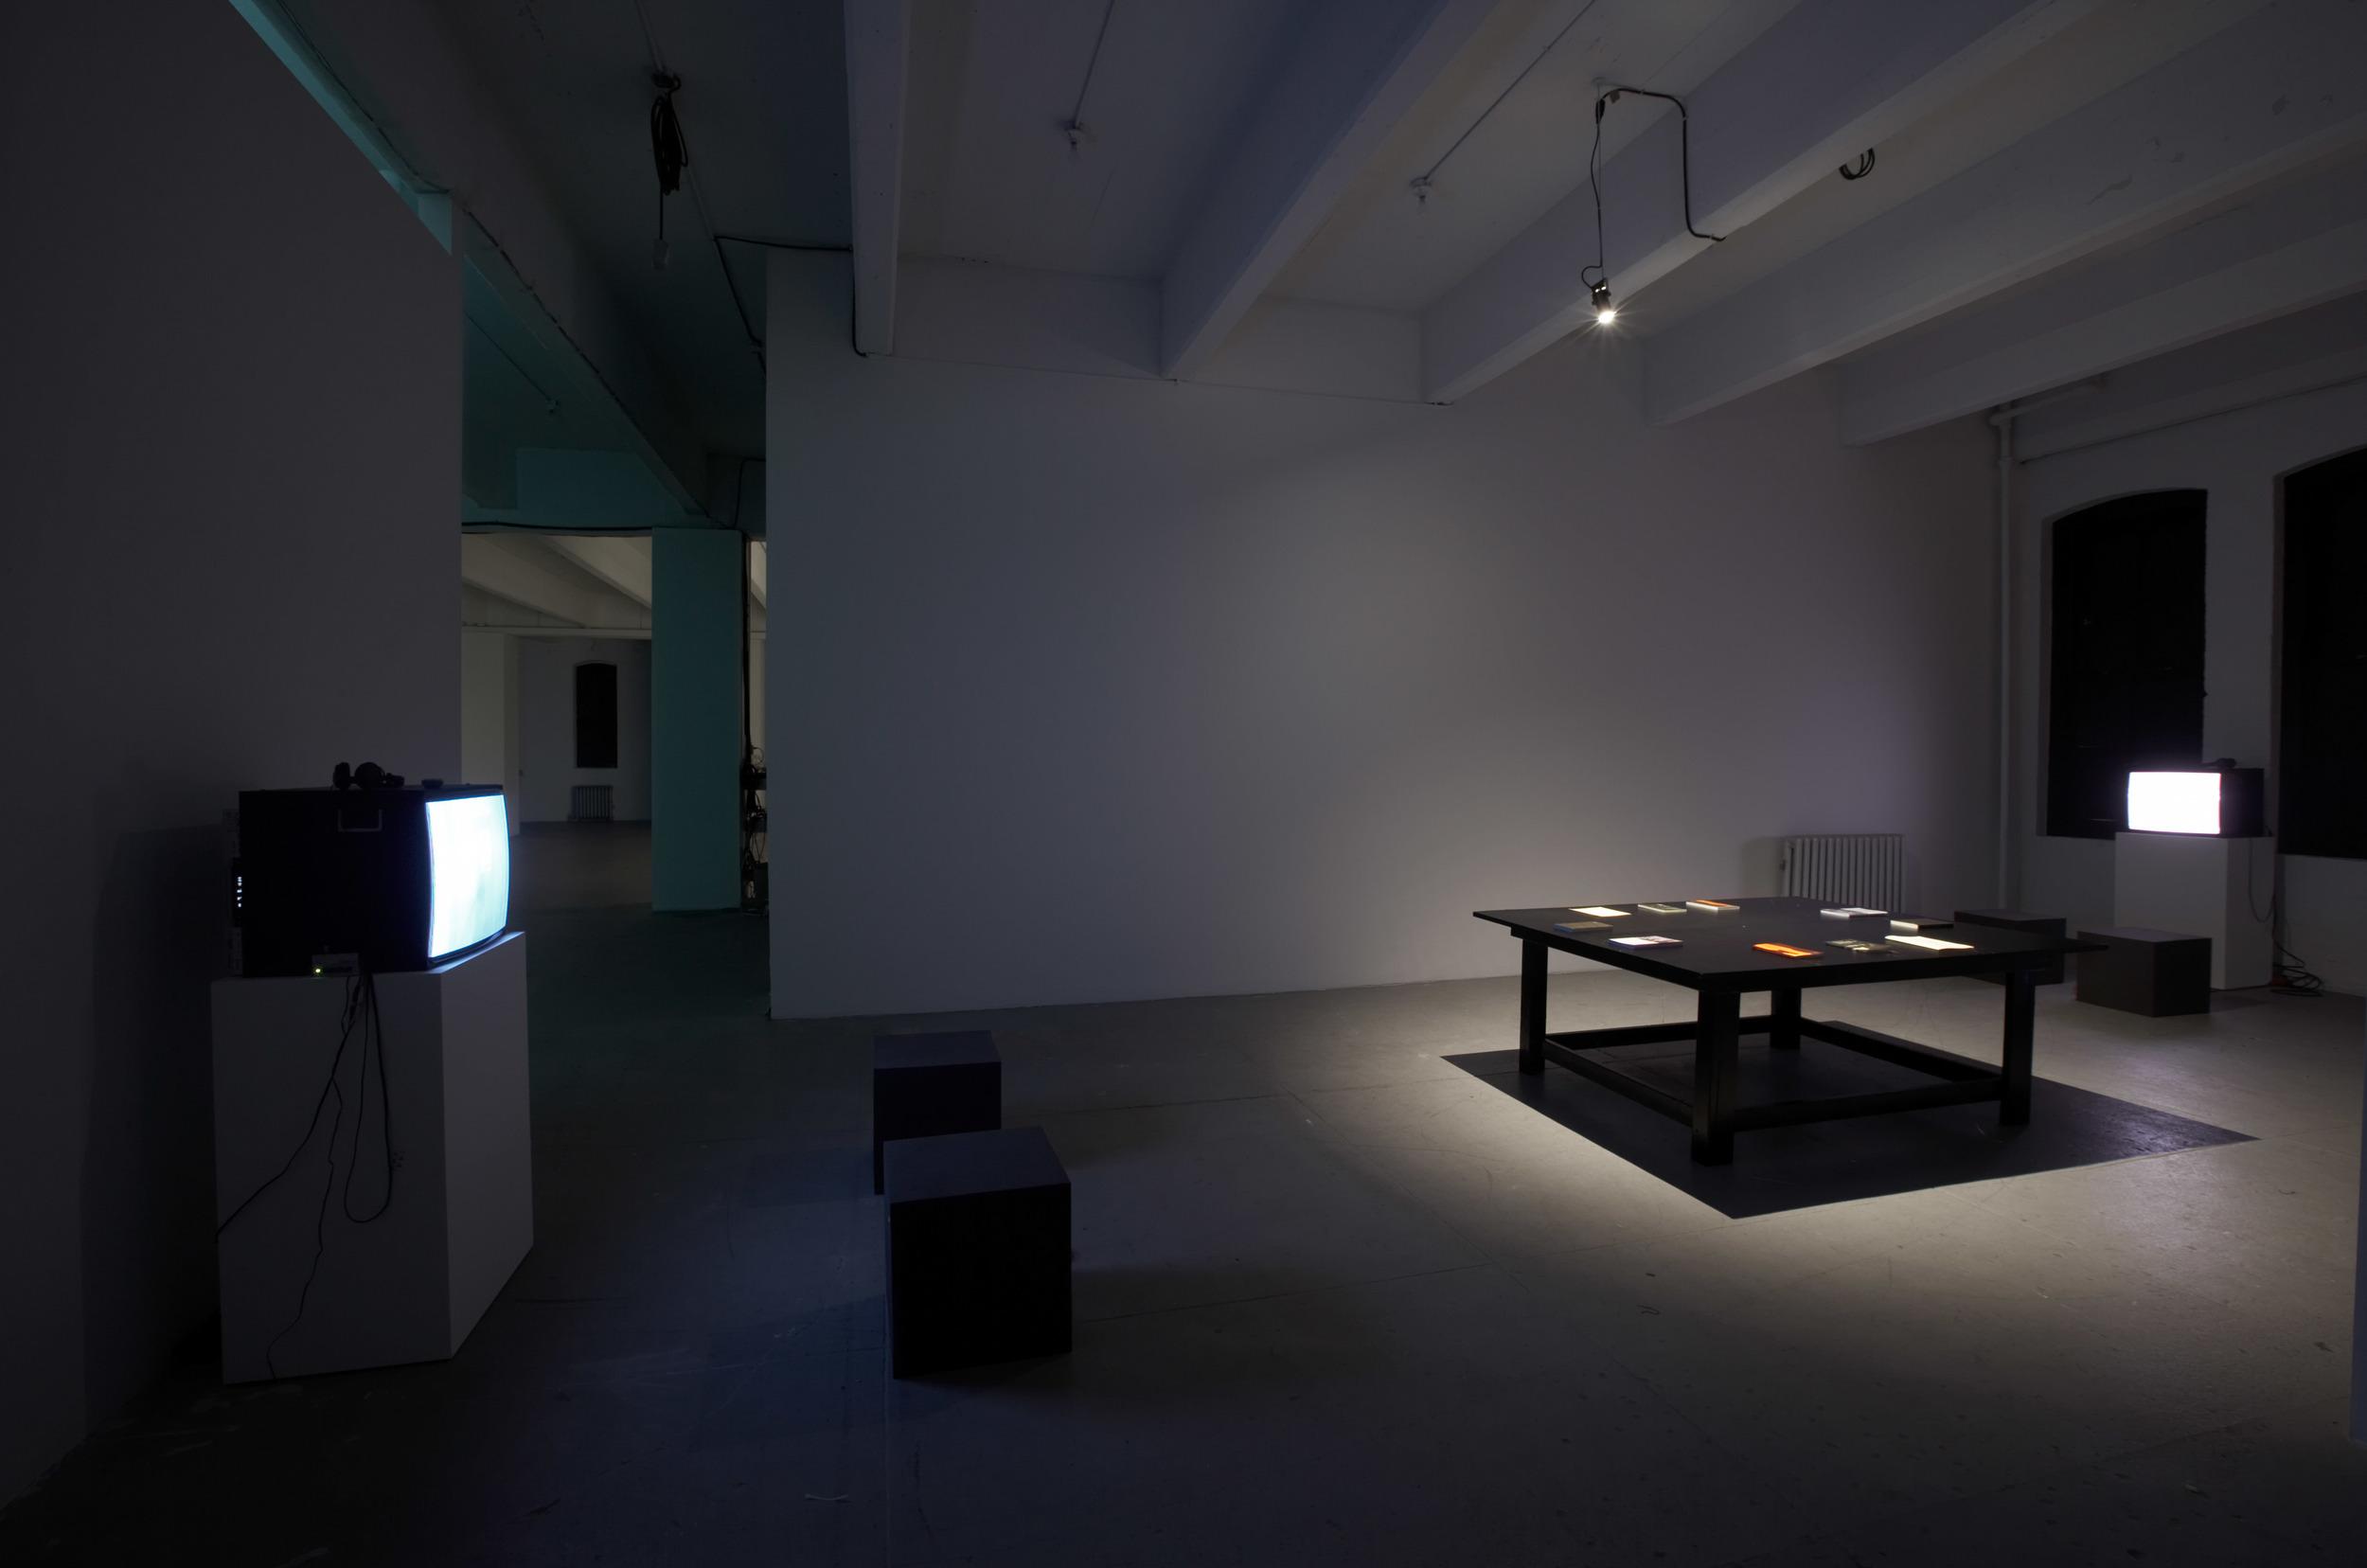 installations & other work